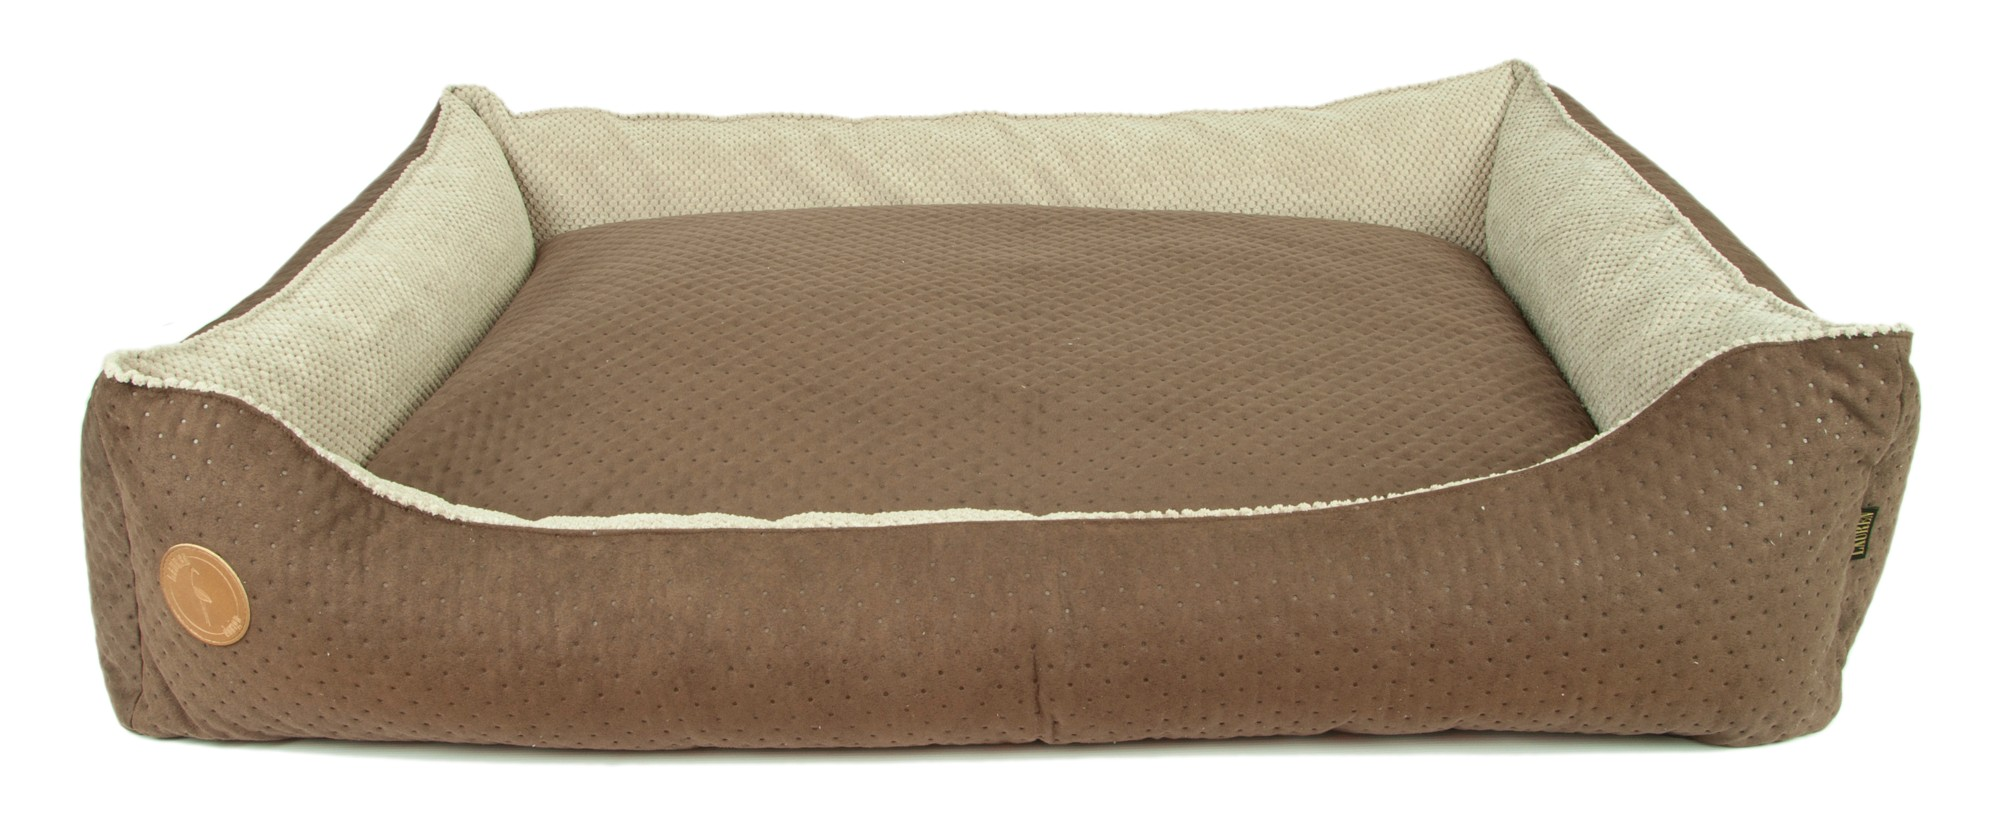 14a9d0ce328ef Pelech pre psa Lauren CEZAR | hnedá. Kvalitný, komfortný pelech, jednoduchá  údržba,